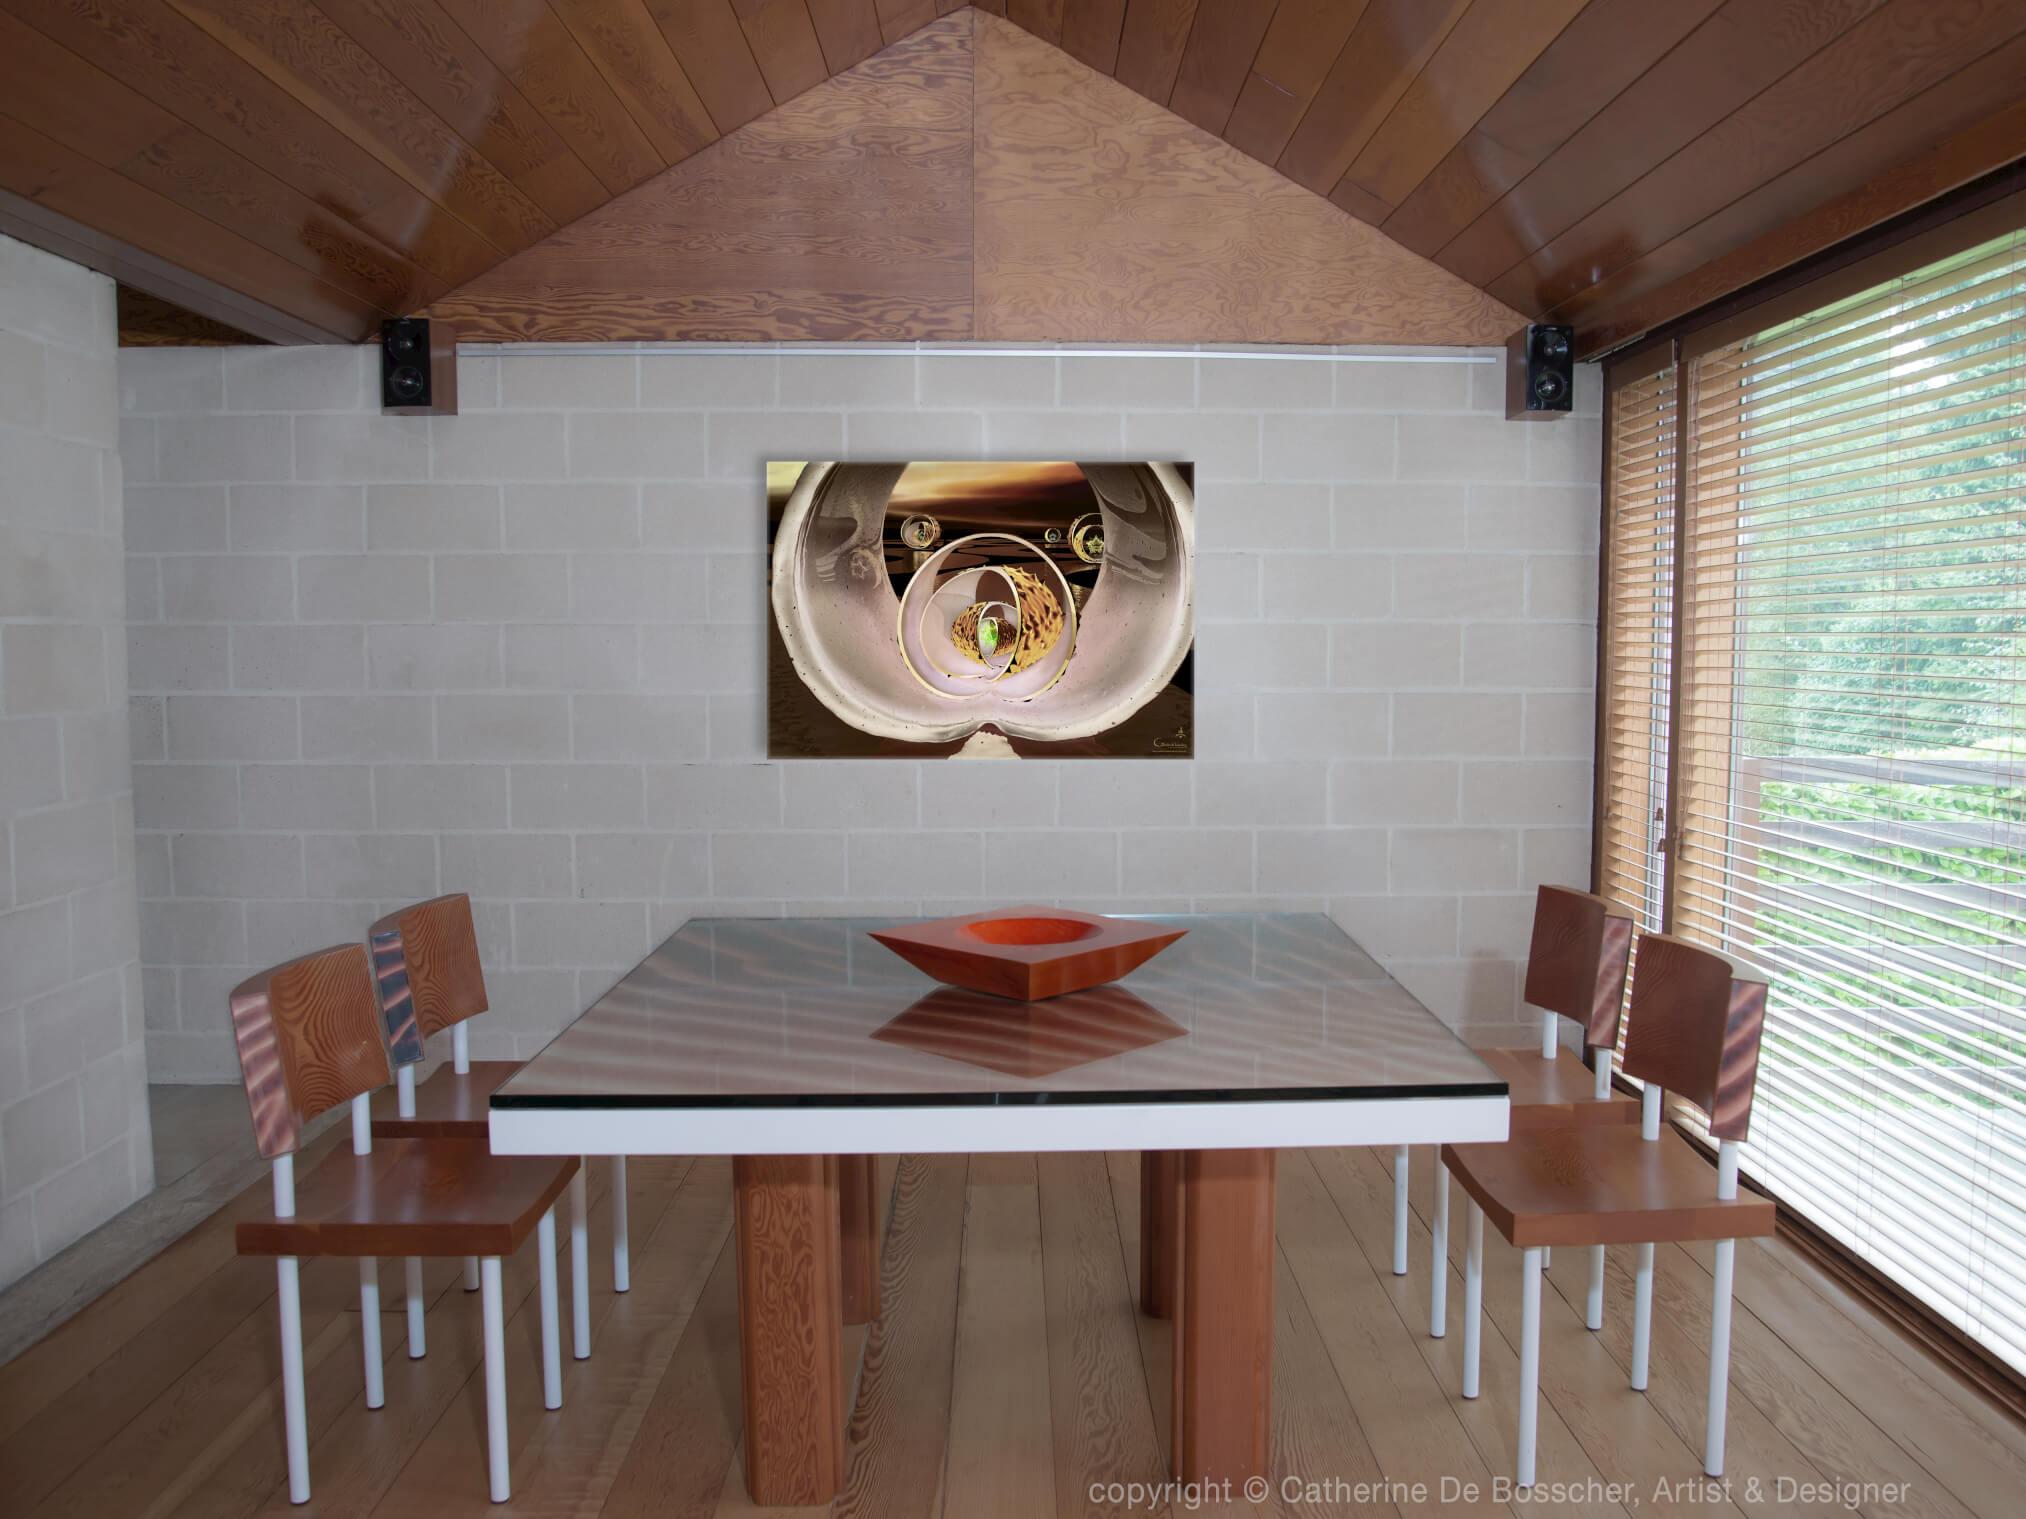 """Crazy Live 1"" Artwork 115 x 80 cm and Sculptural Bowl 40 cm by Catherine De Bosscher"